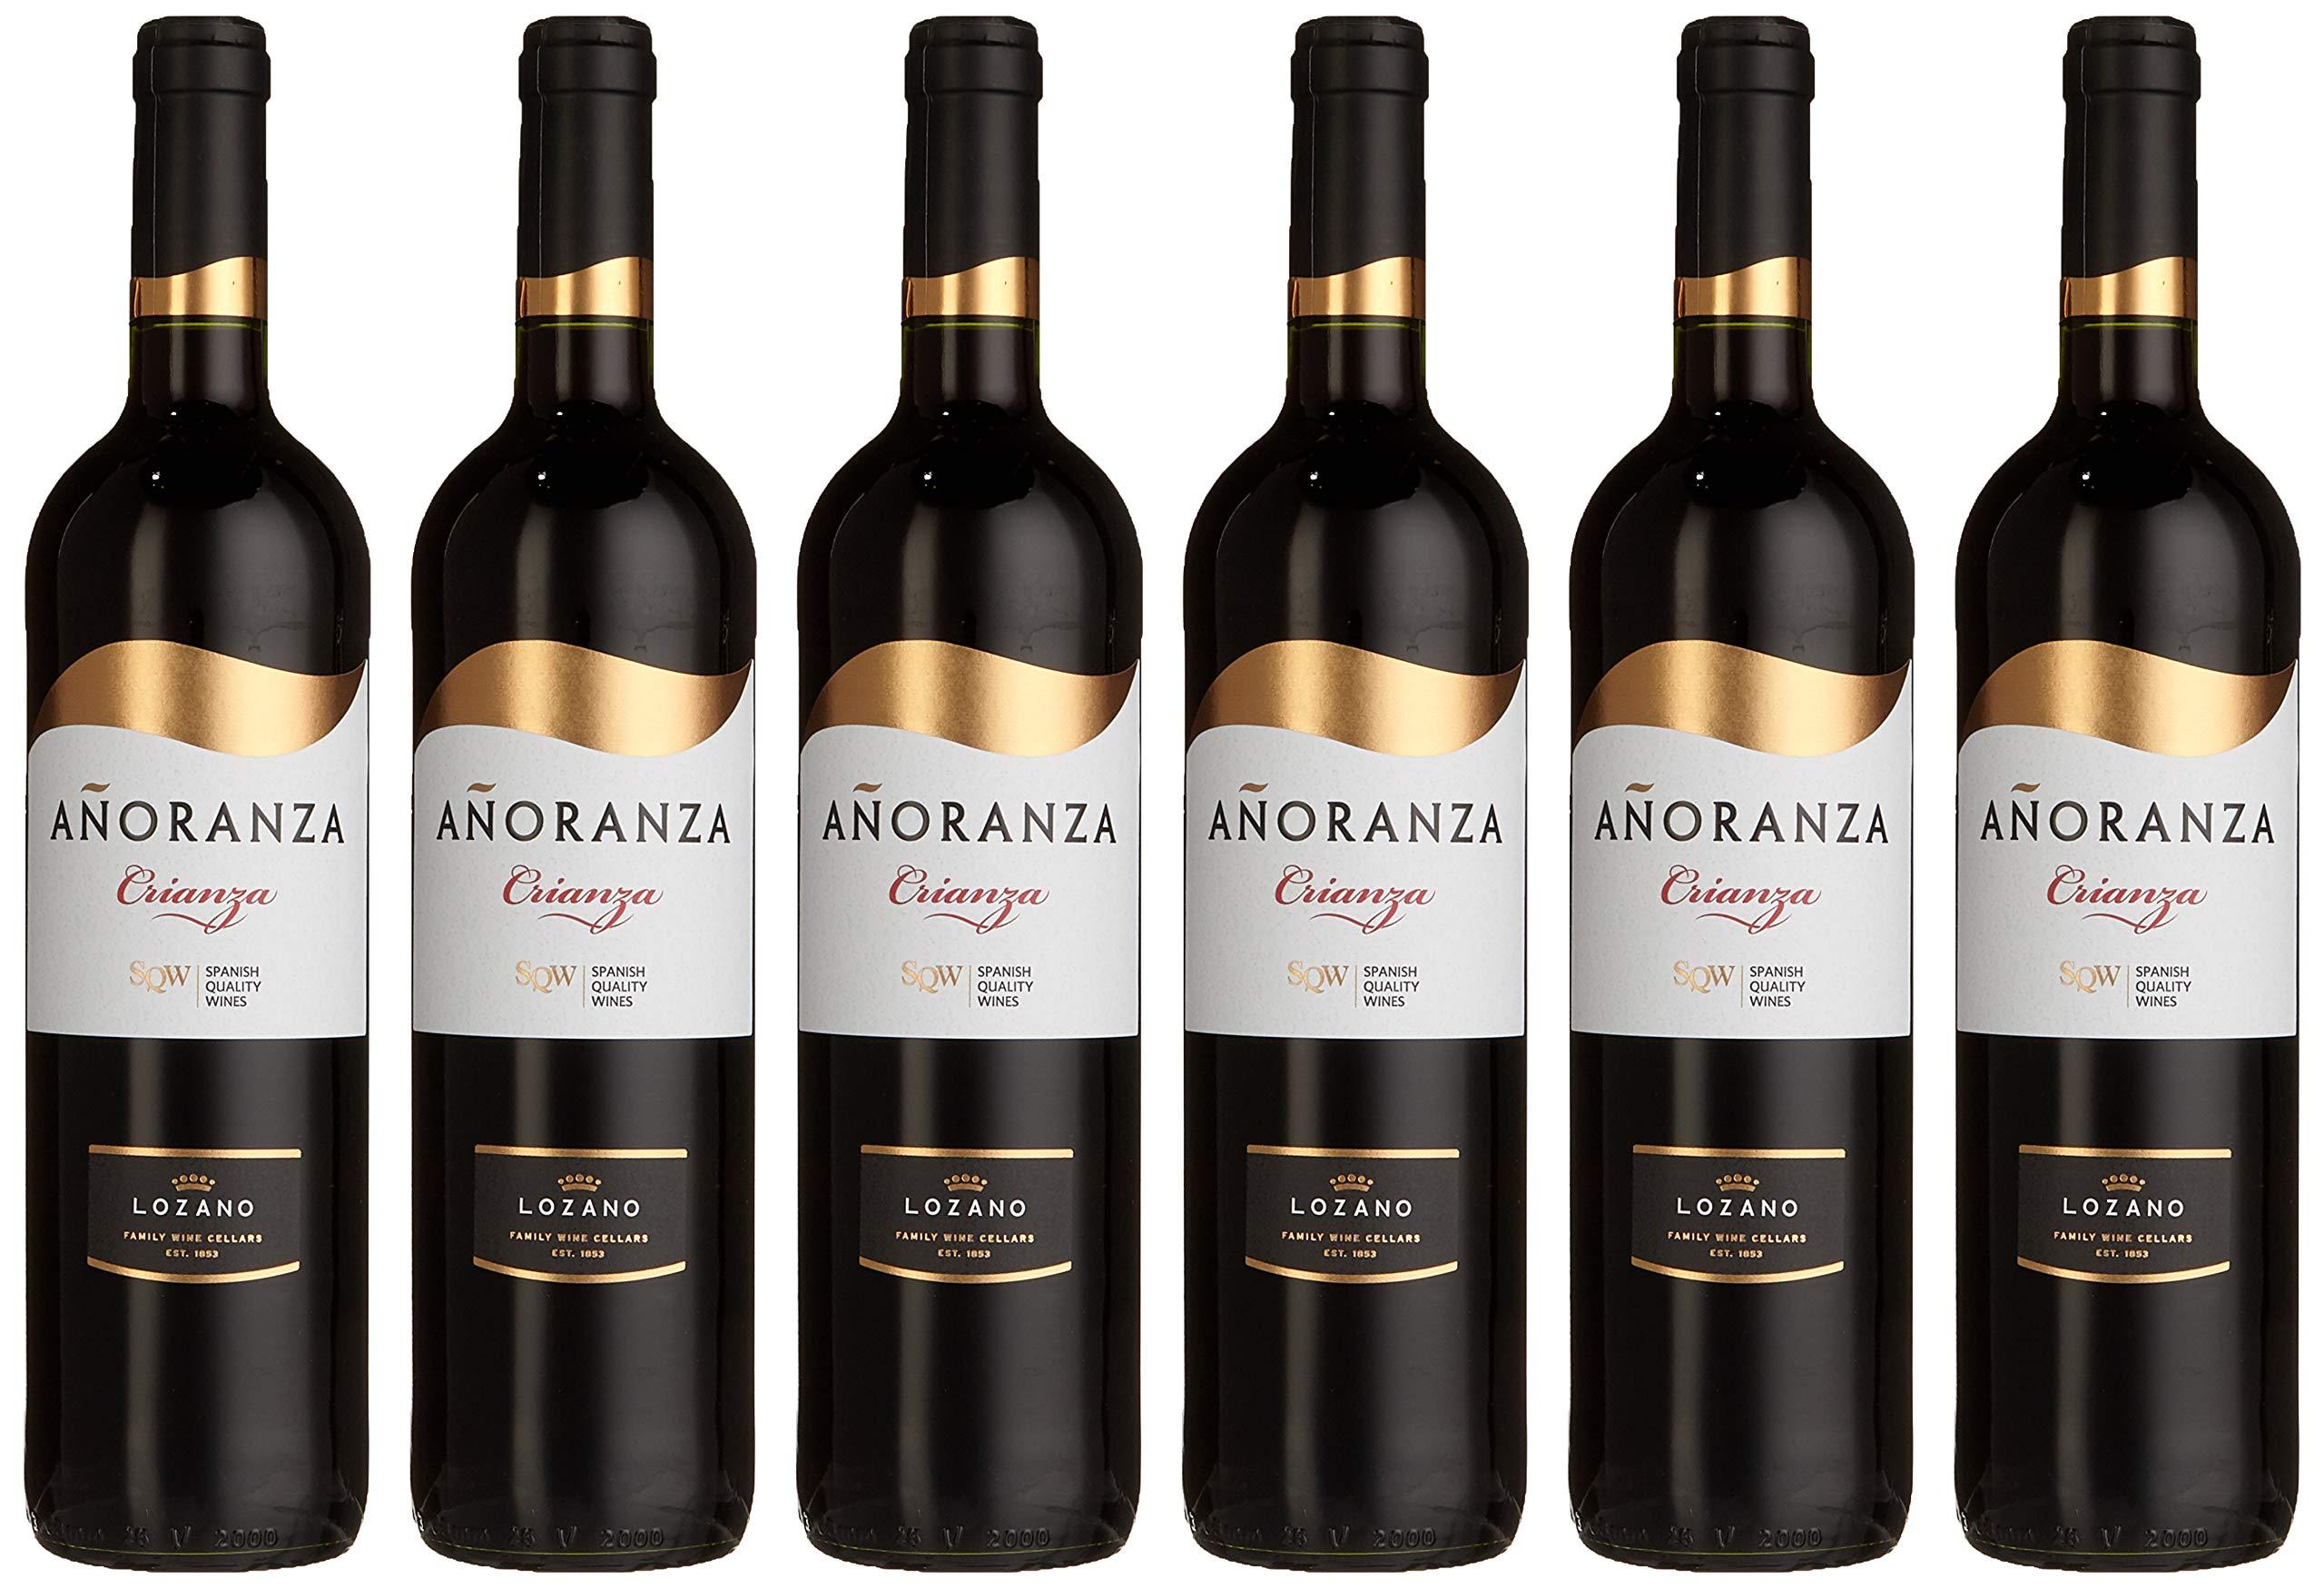 Juan-Ramn-Lozano-Aoranza-Crianza-Bodegas-Tempranillo-2014-Trocken-6-x-075-l